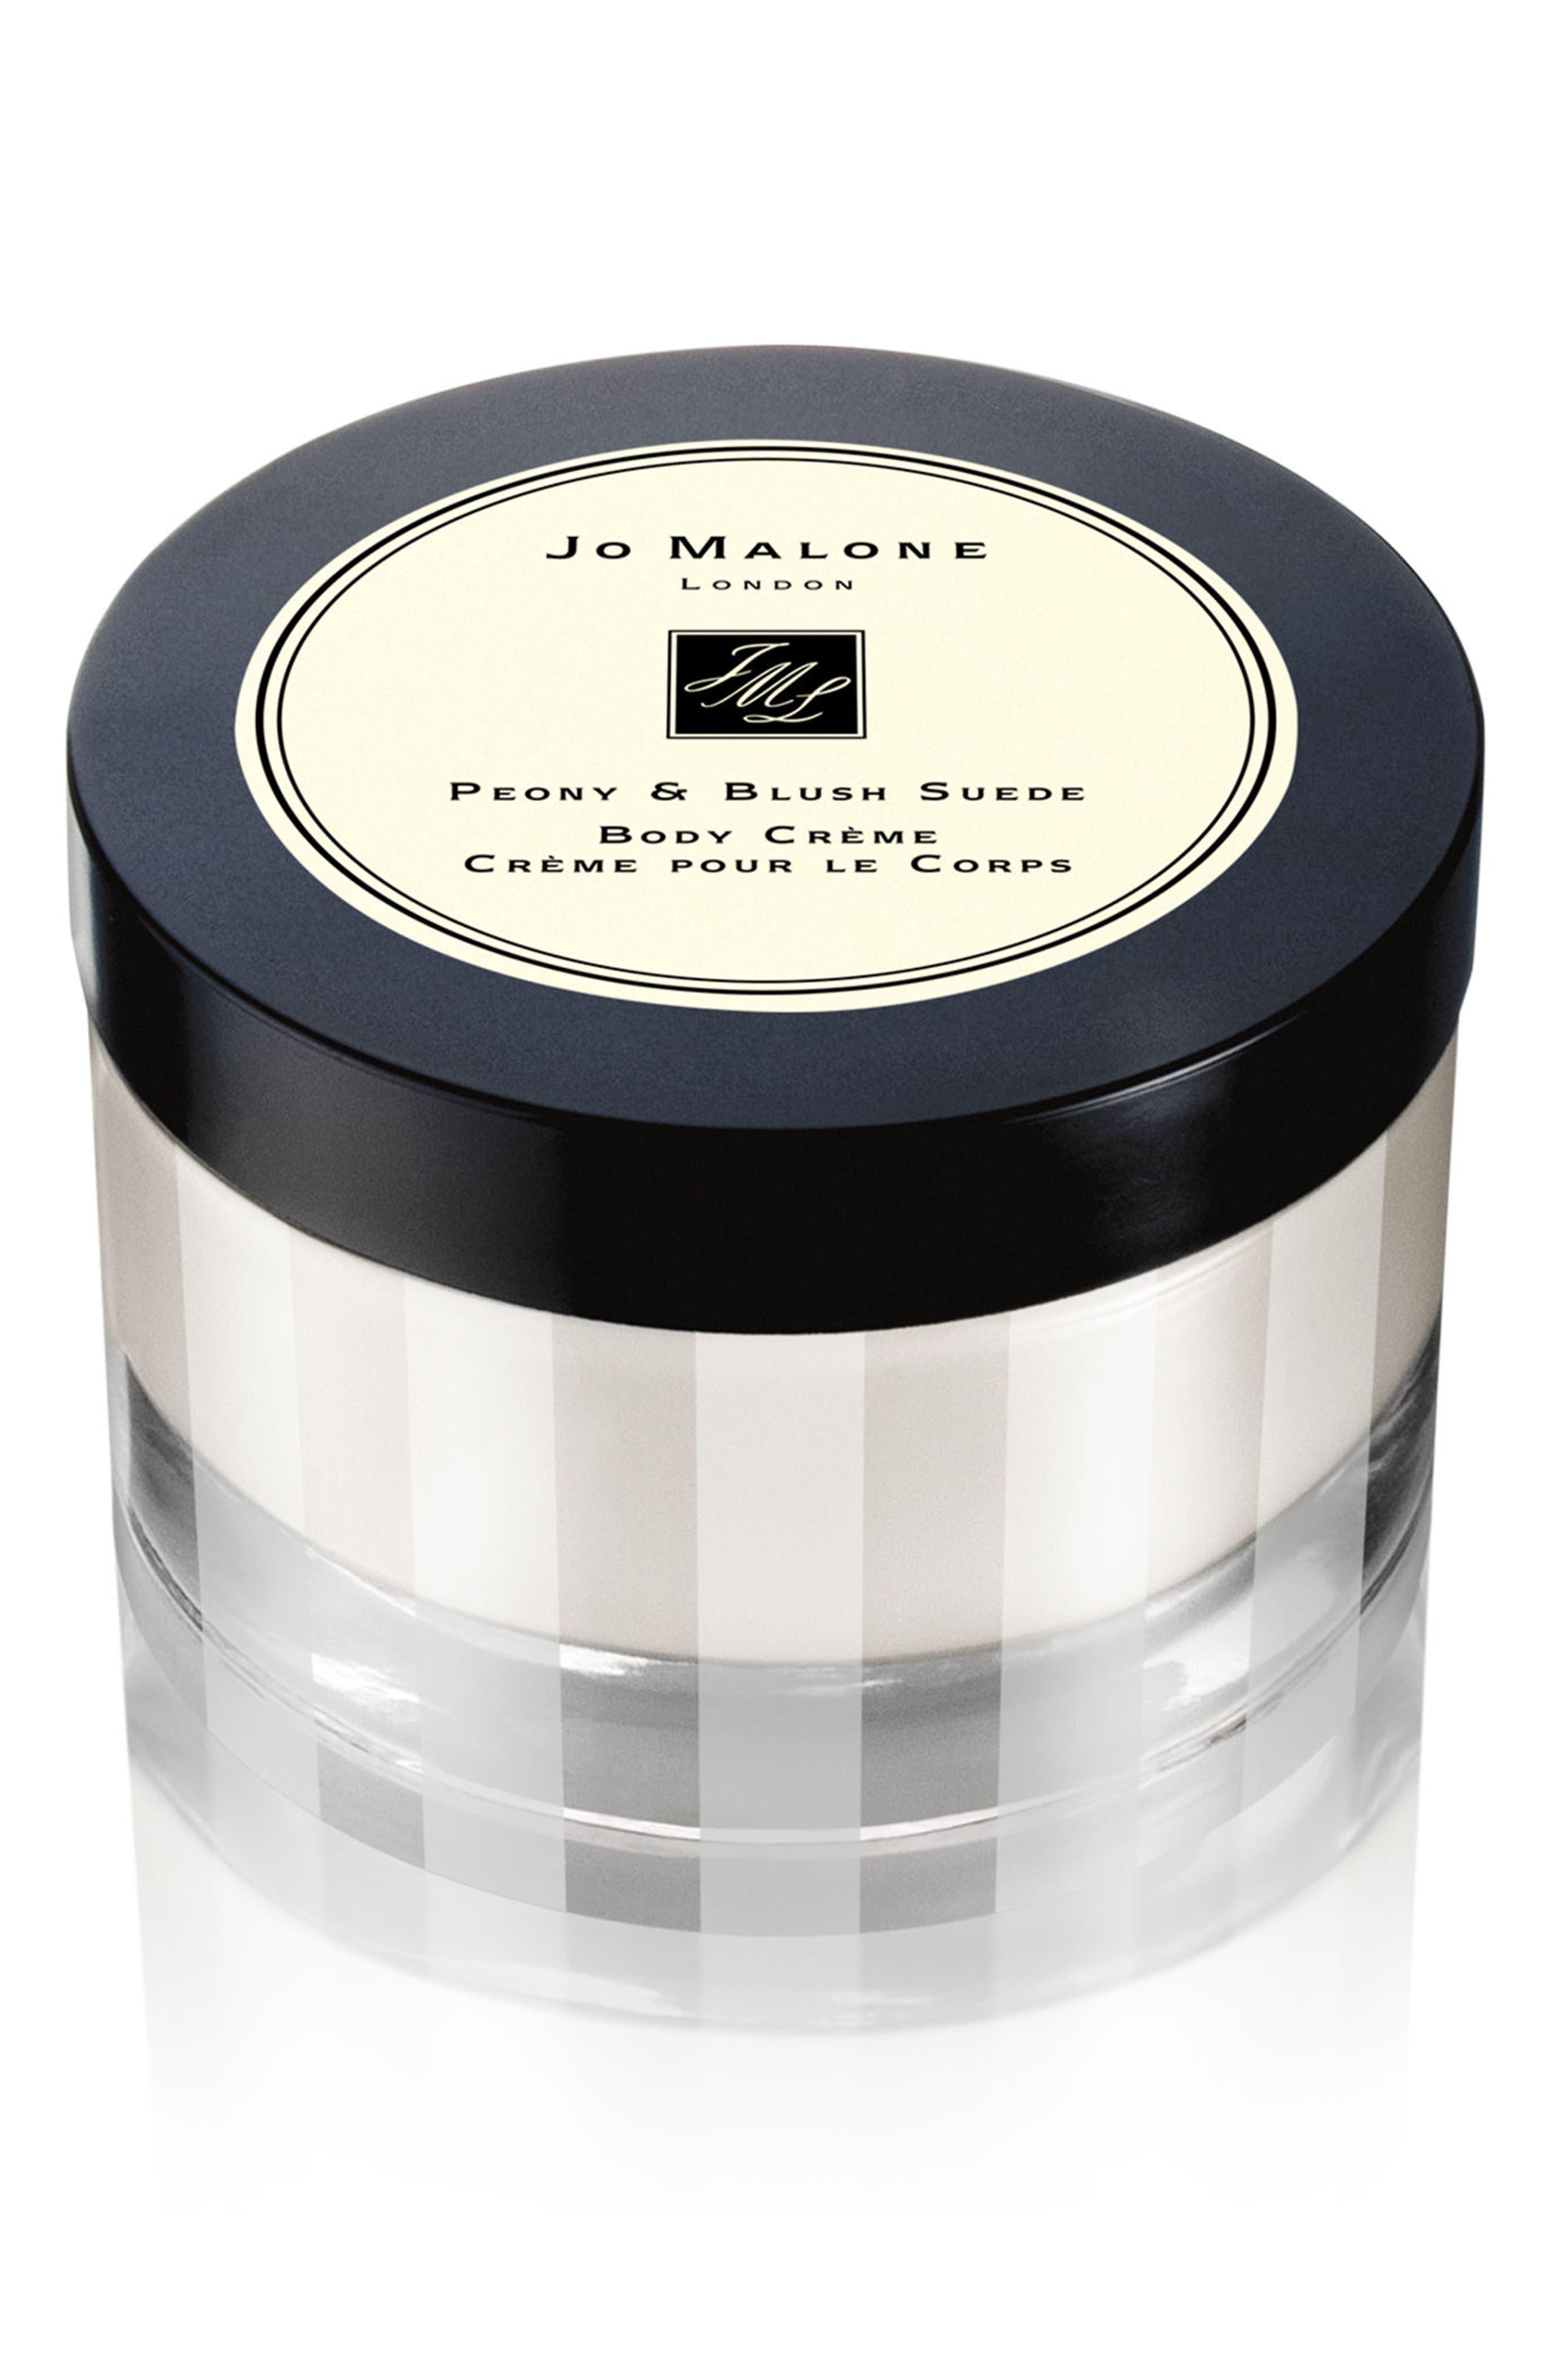 Peony & Blush Suede Body Crème,                         Main,                         color, 000